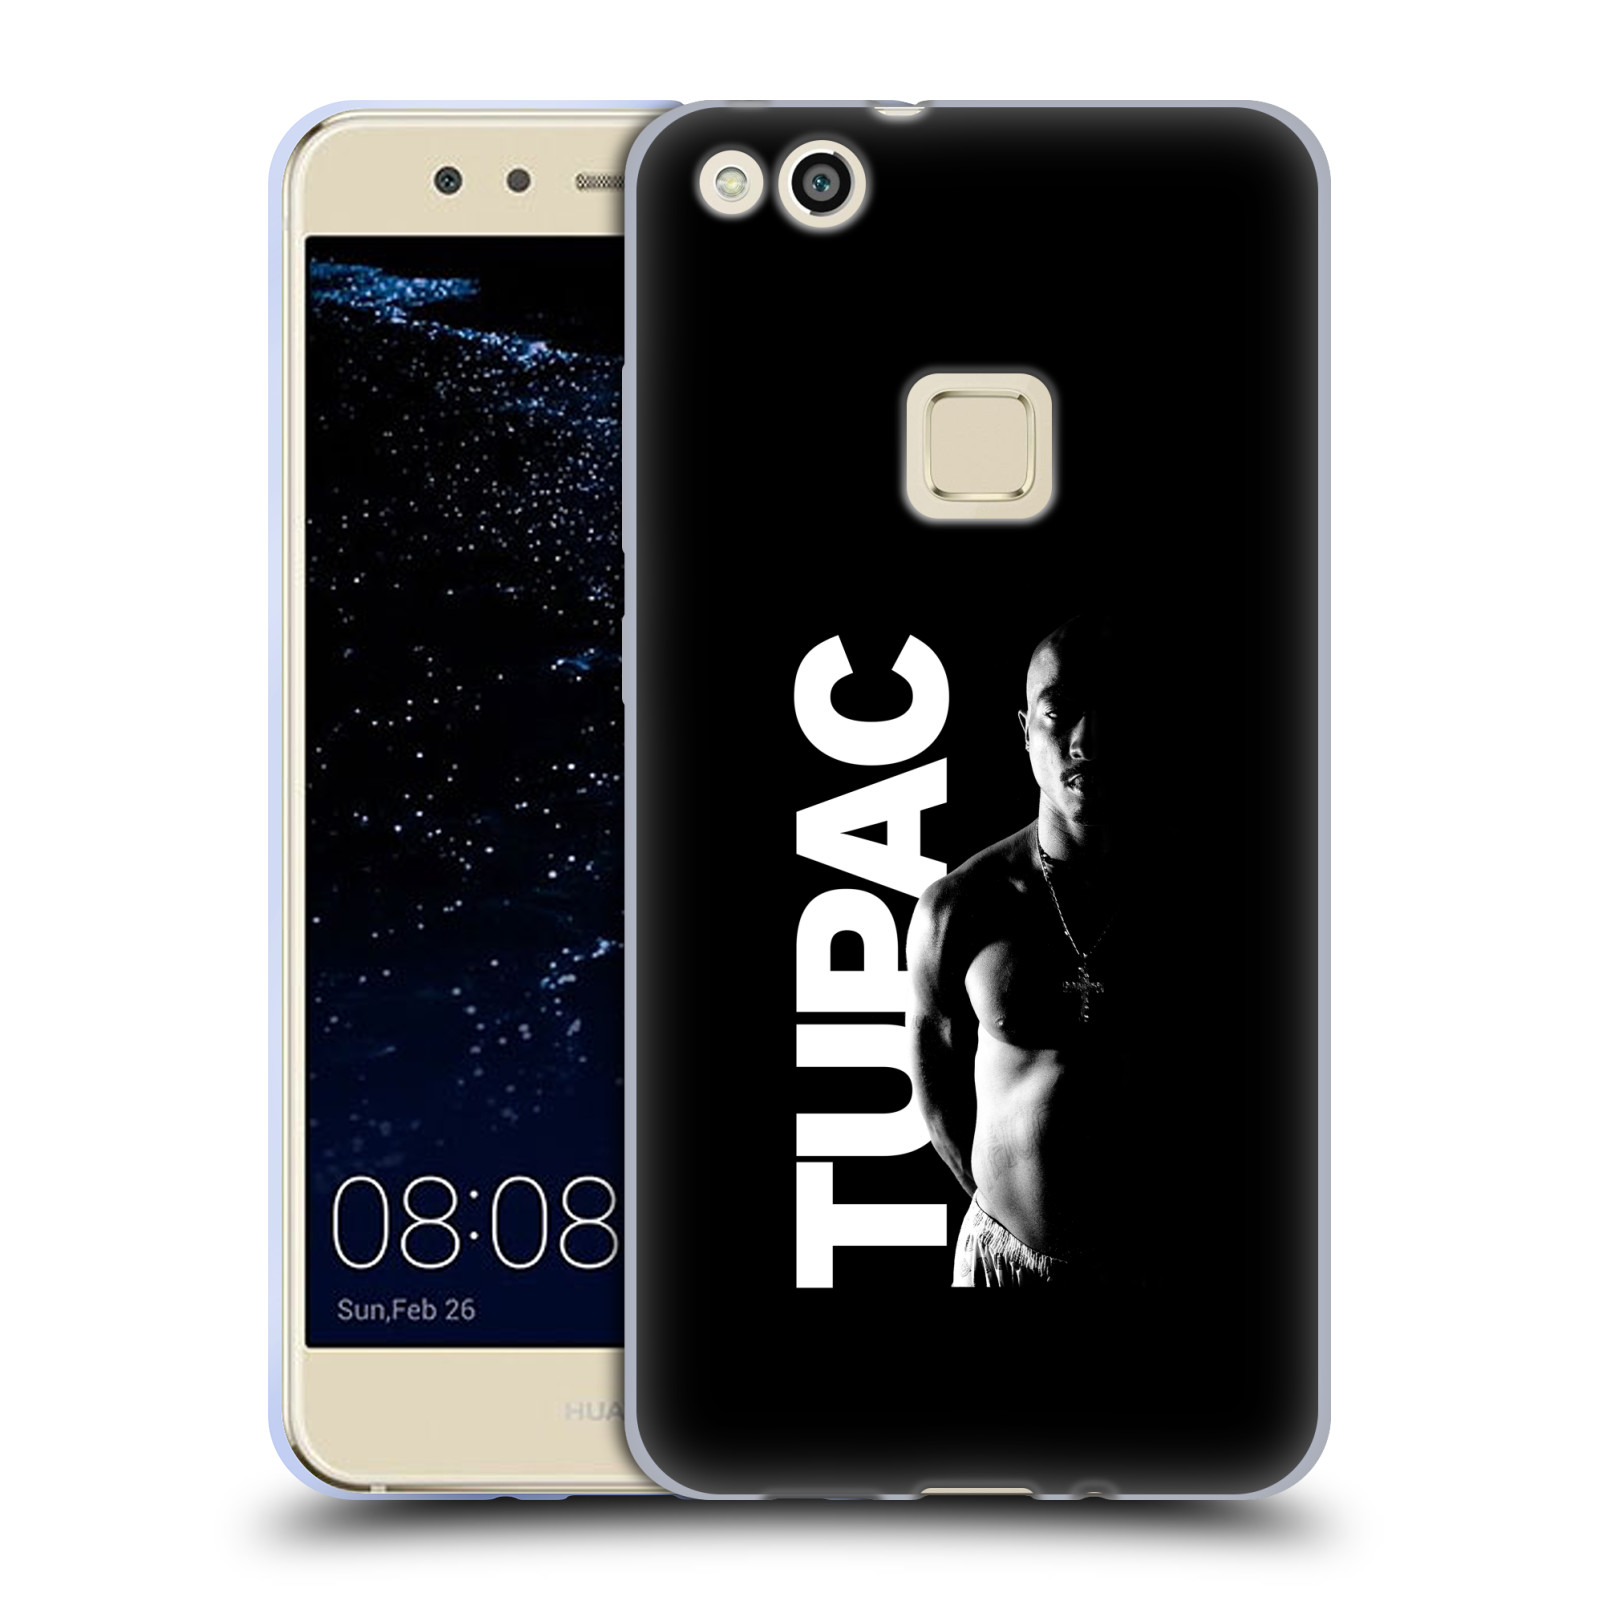 Silikonové pouzdro na mobil Huawei P10 Lite Head Case - TUPAC - Black and White